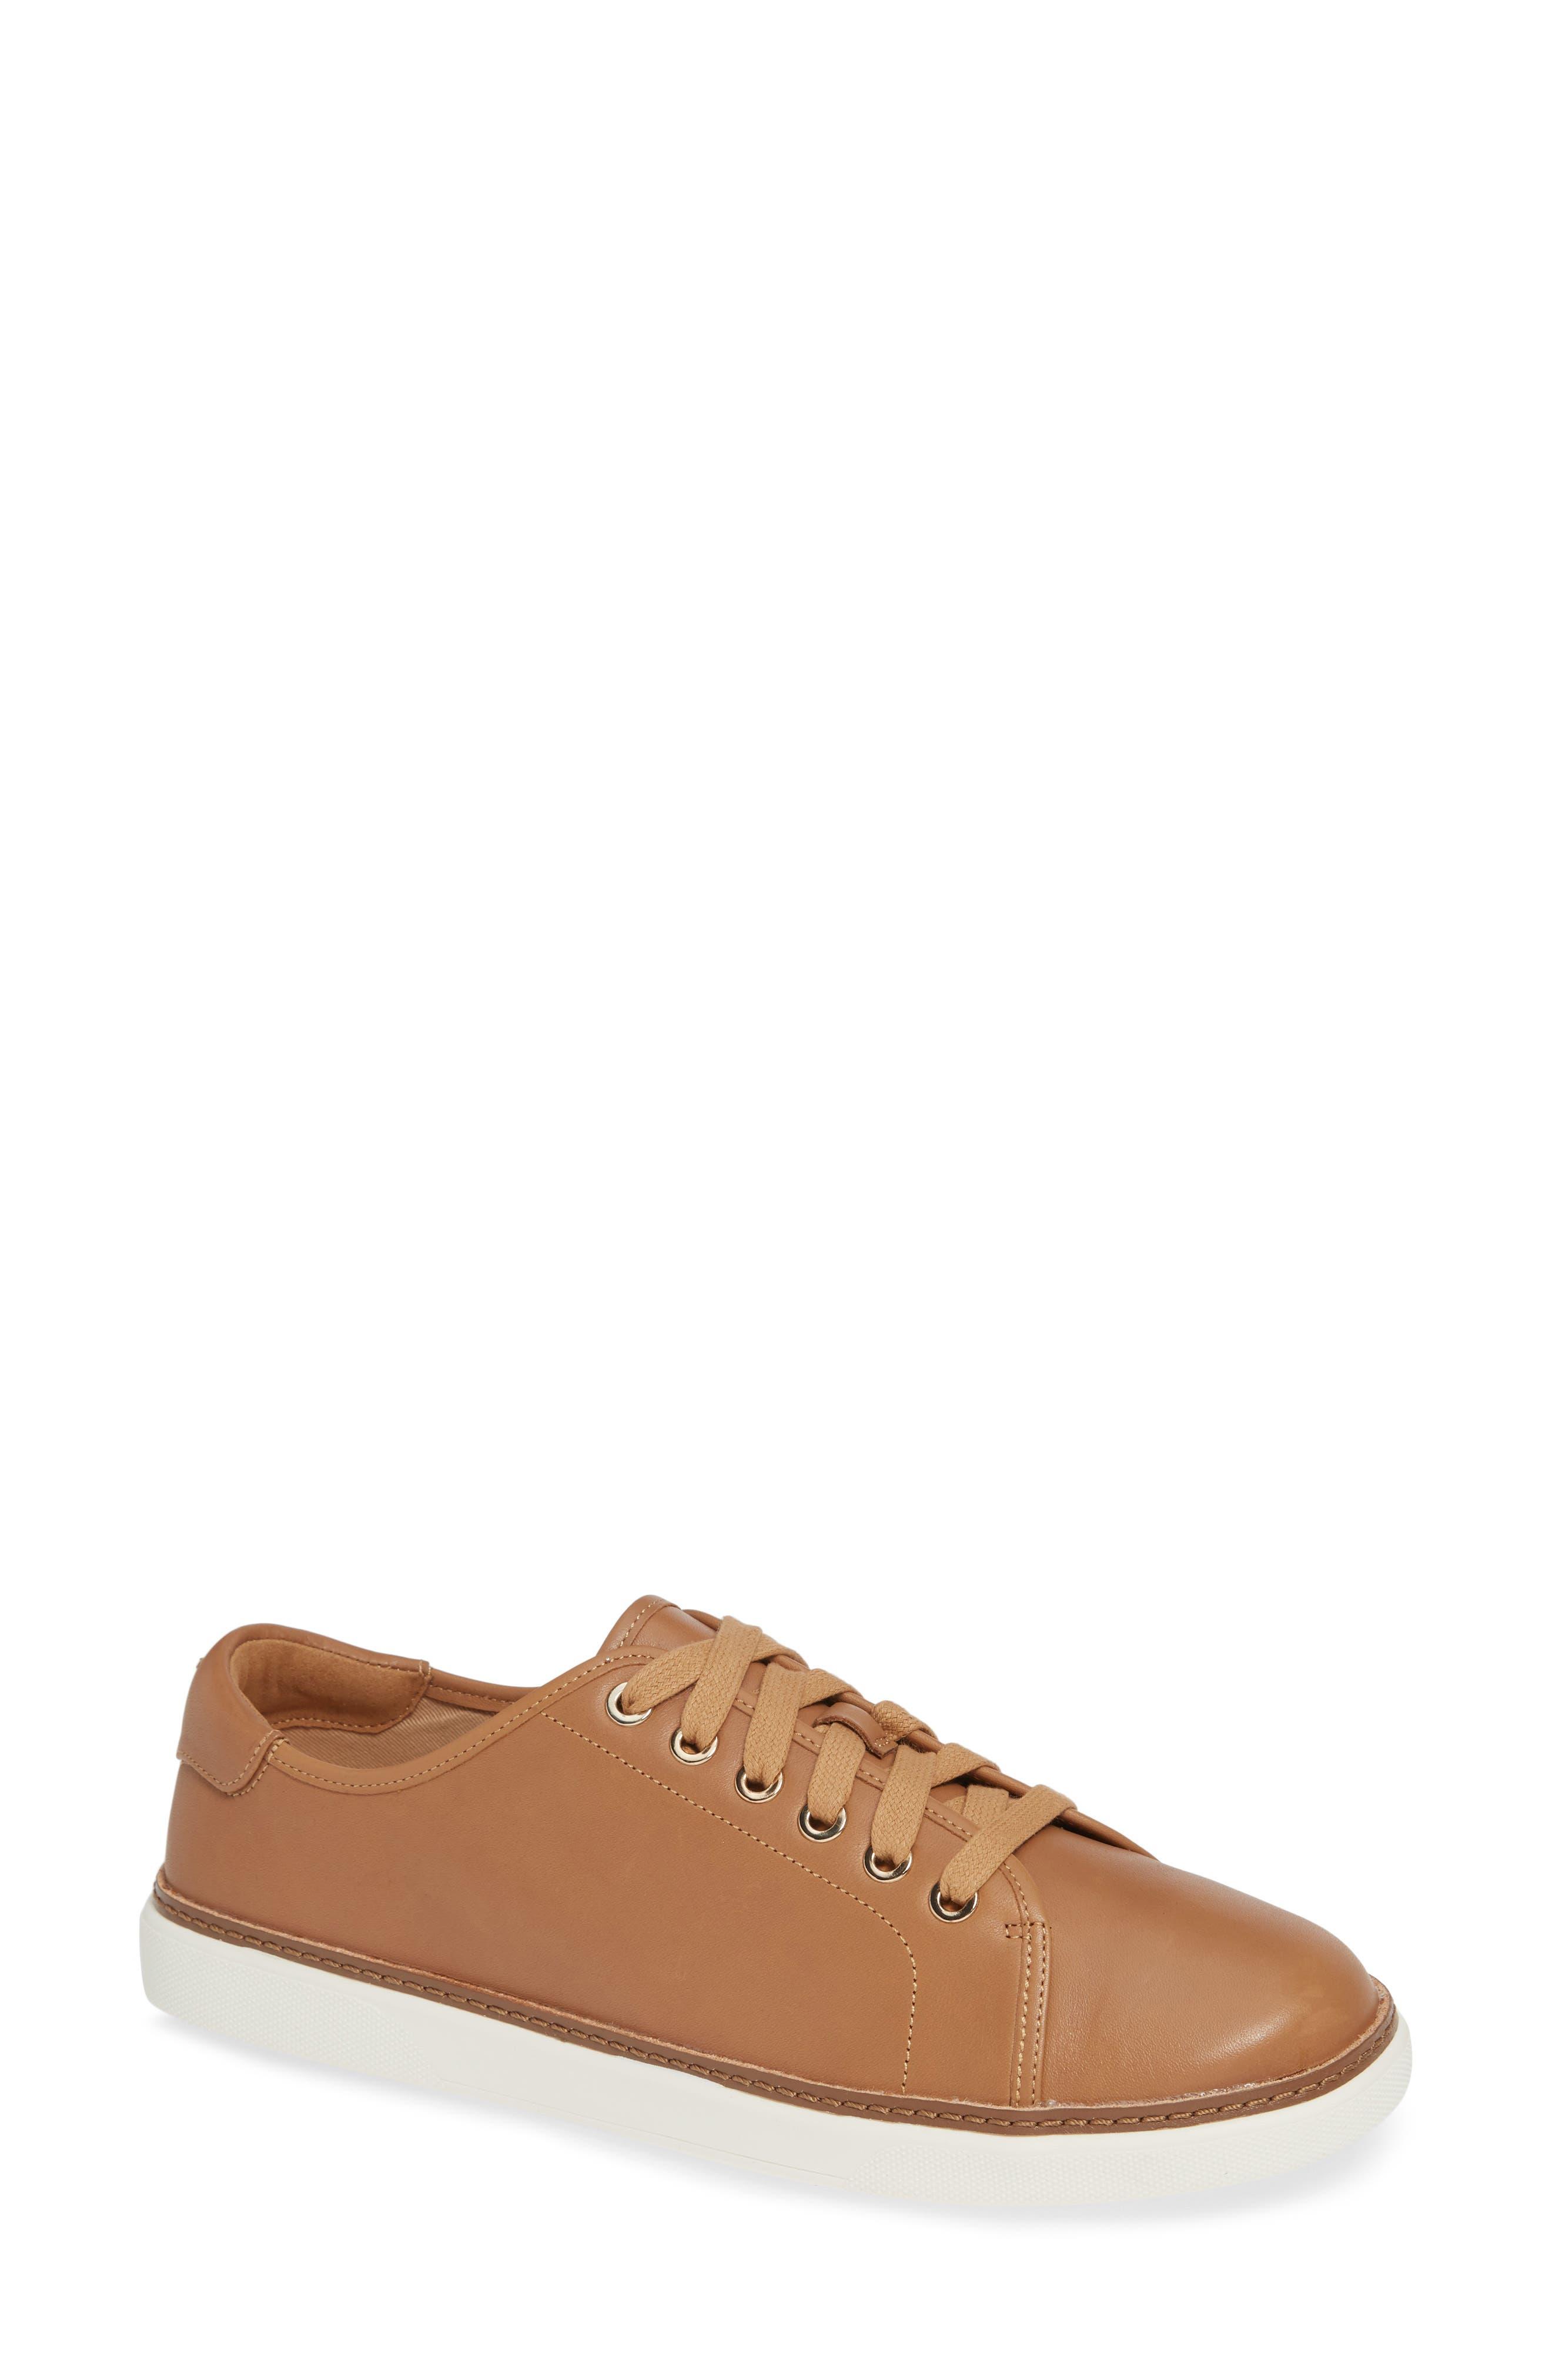 Leah Sneaker,                         Main,                         color, TAN LEATHER